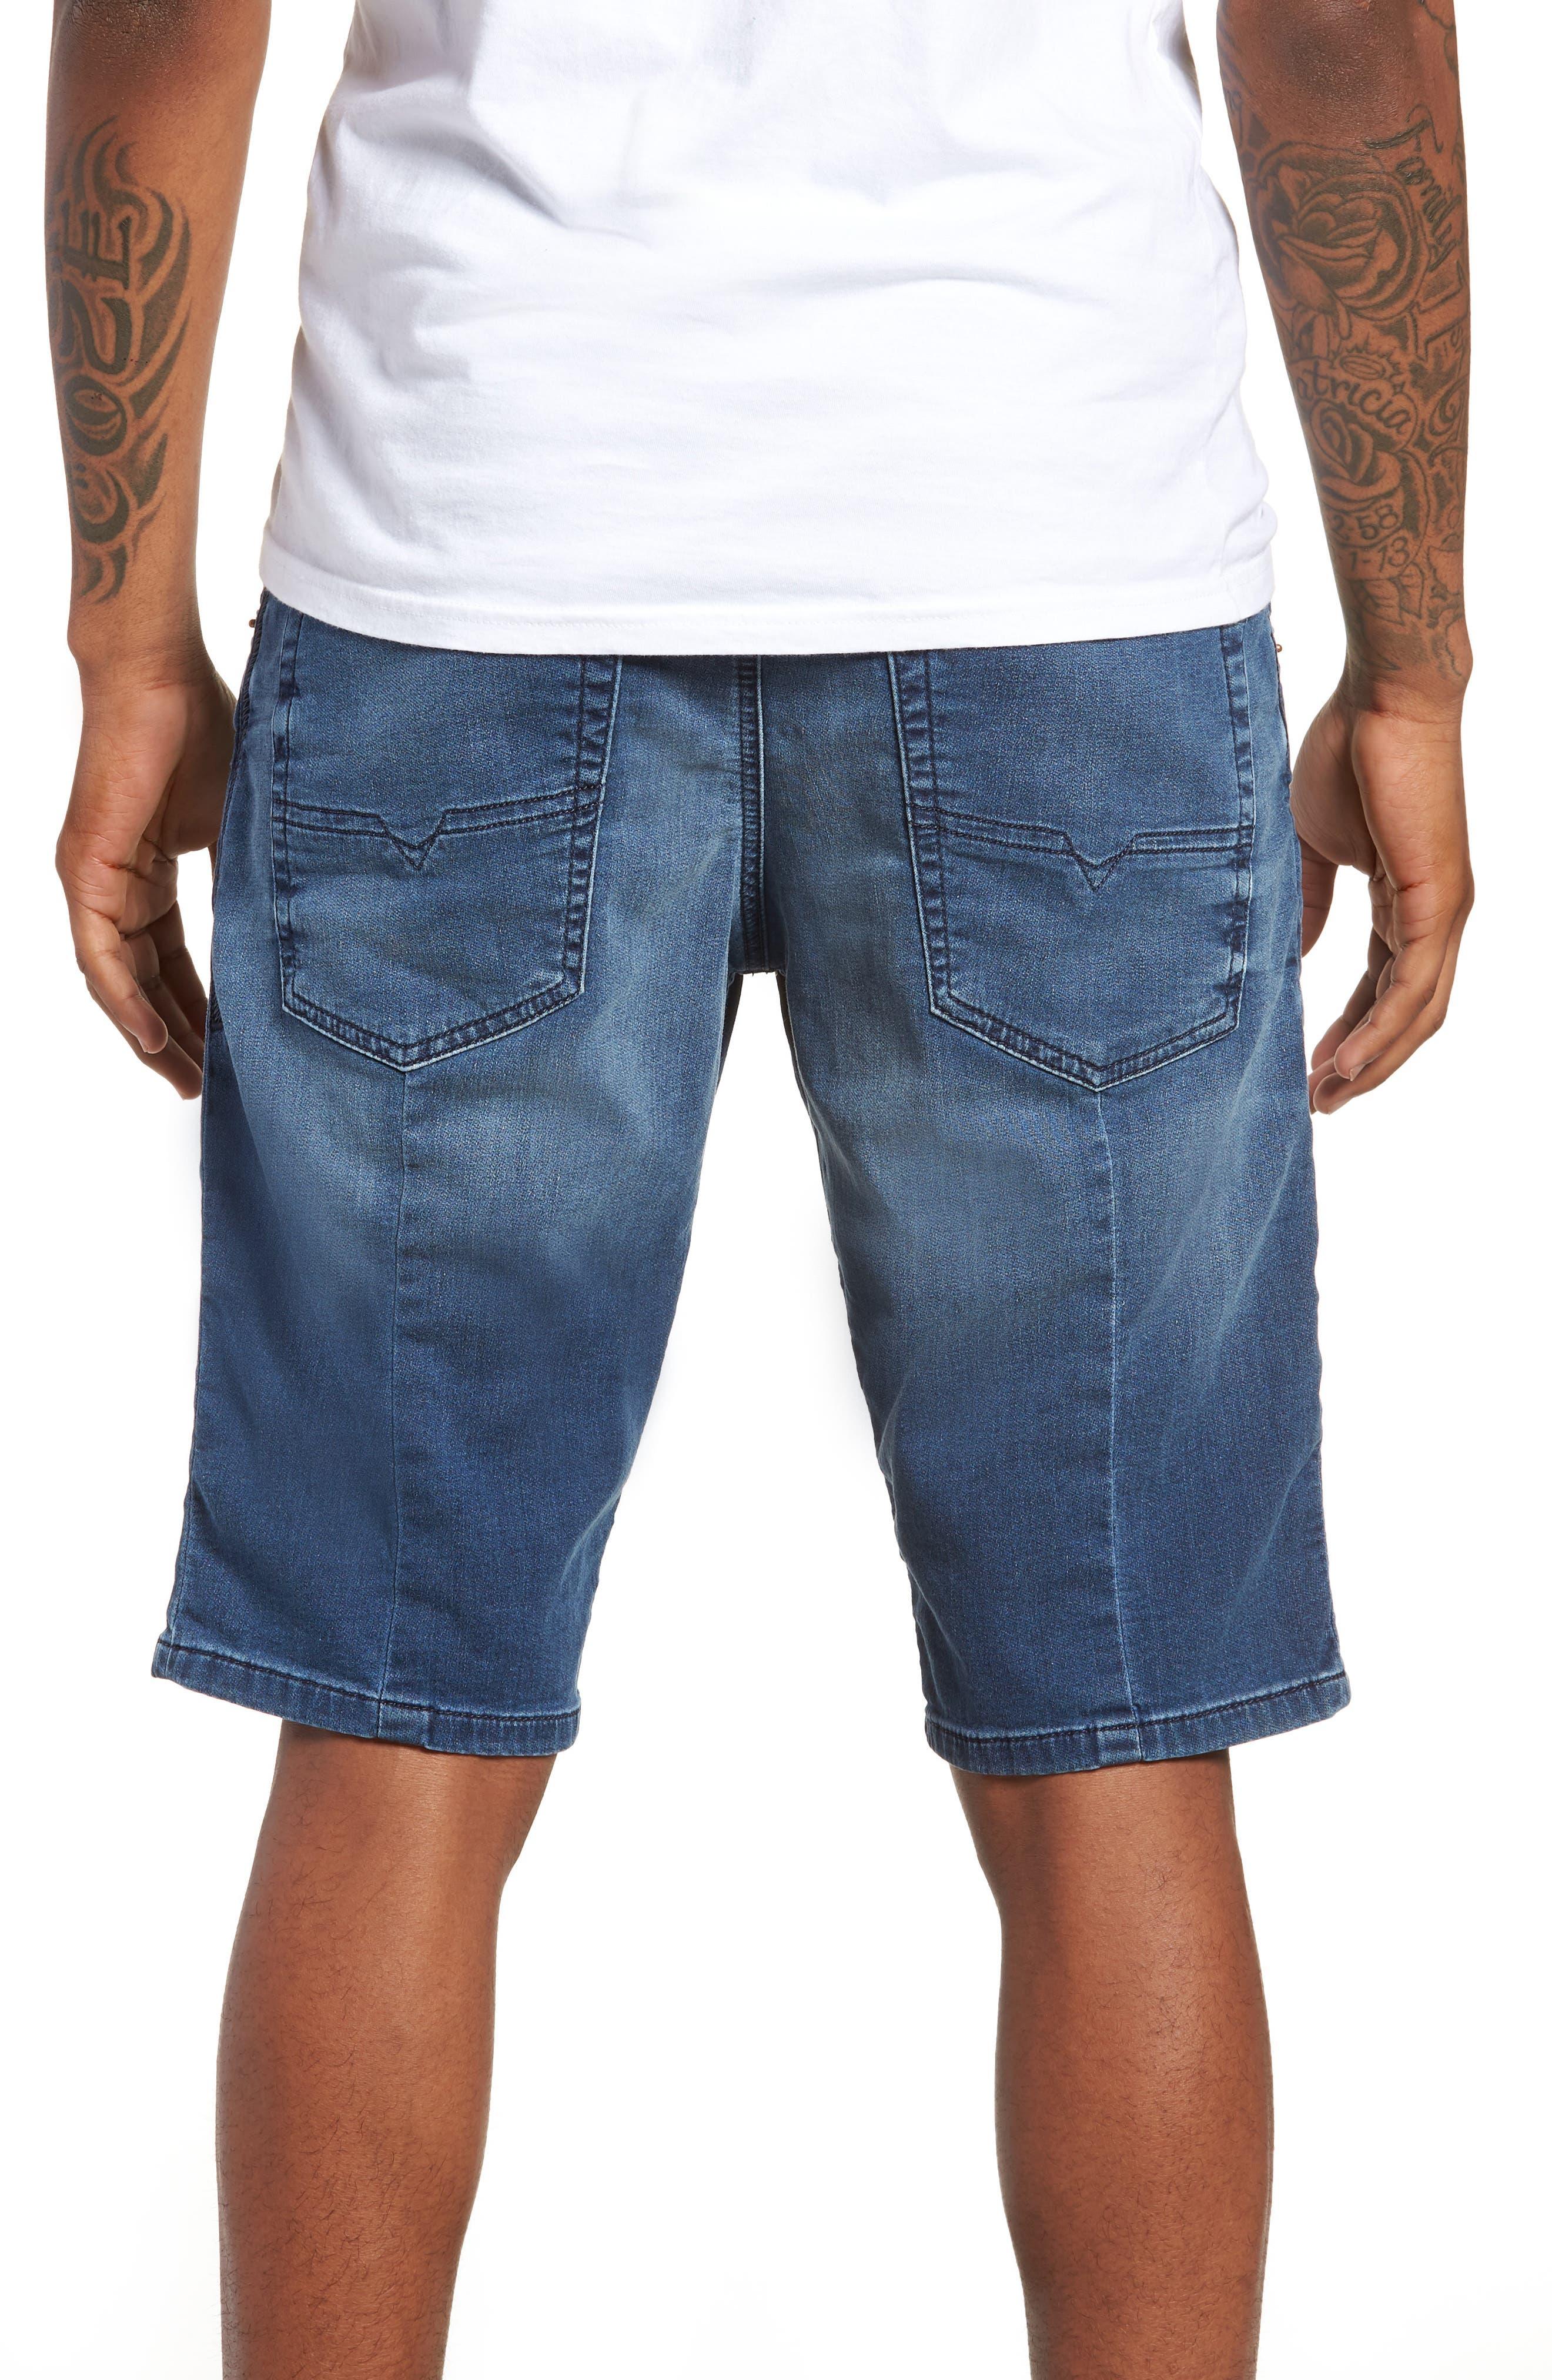 Krooshort Denim Shorts,                             Alternate thumbnail 2, color,